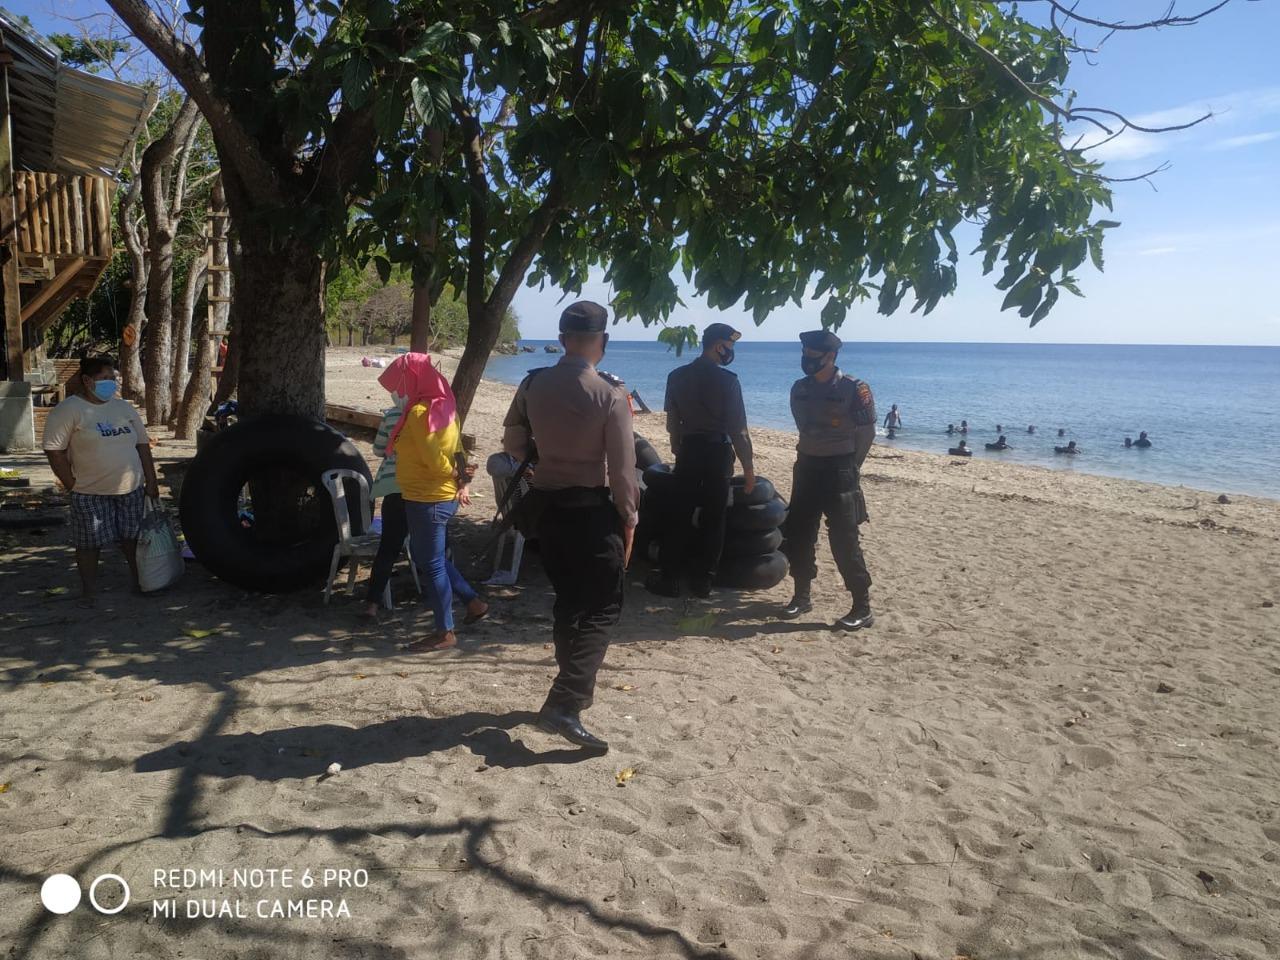 Polisi Pantau Tempat Wisata saat Weekend